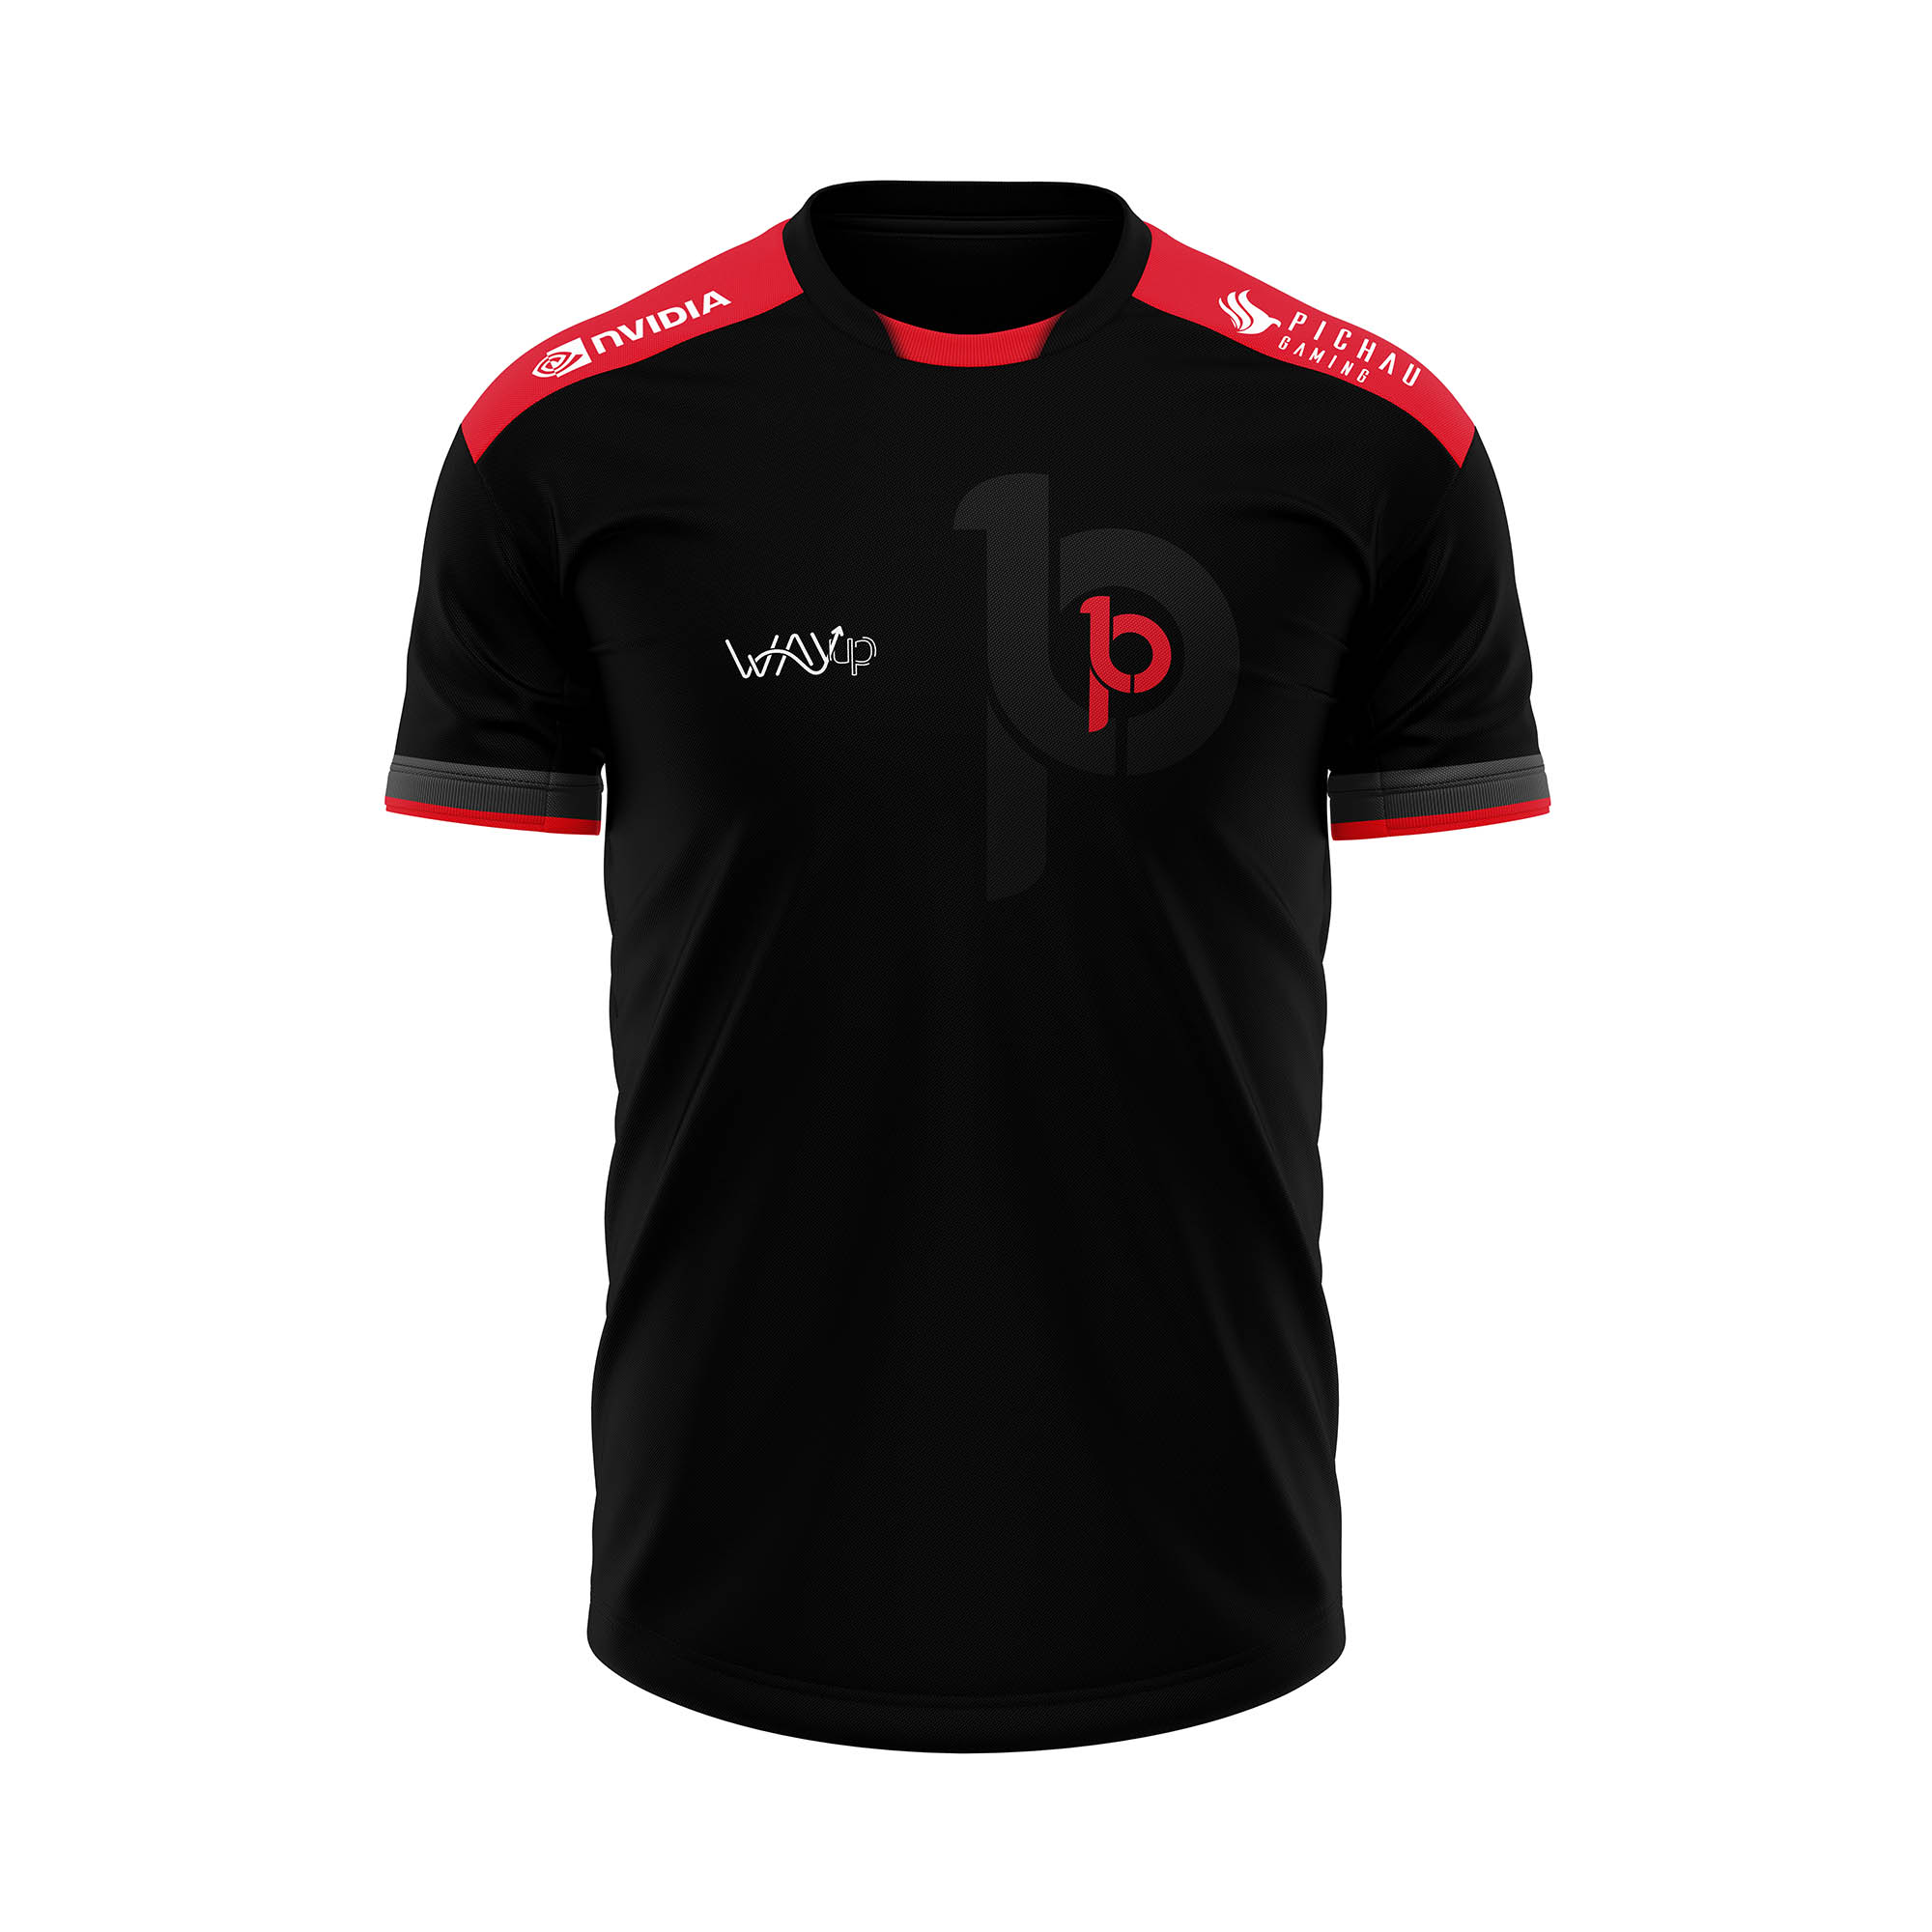 Camiseta Jersey Paquetá Gaming Oficial 2021